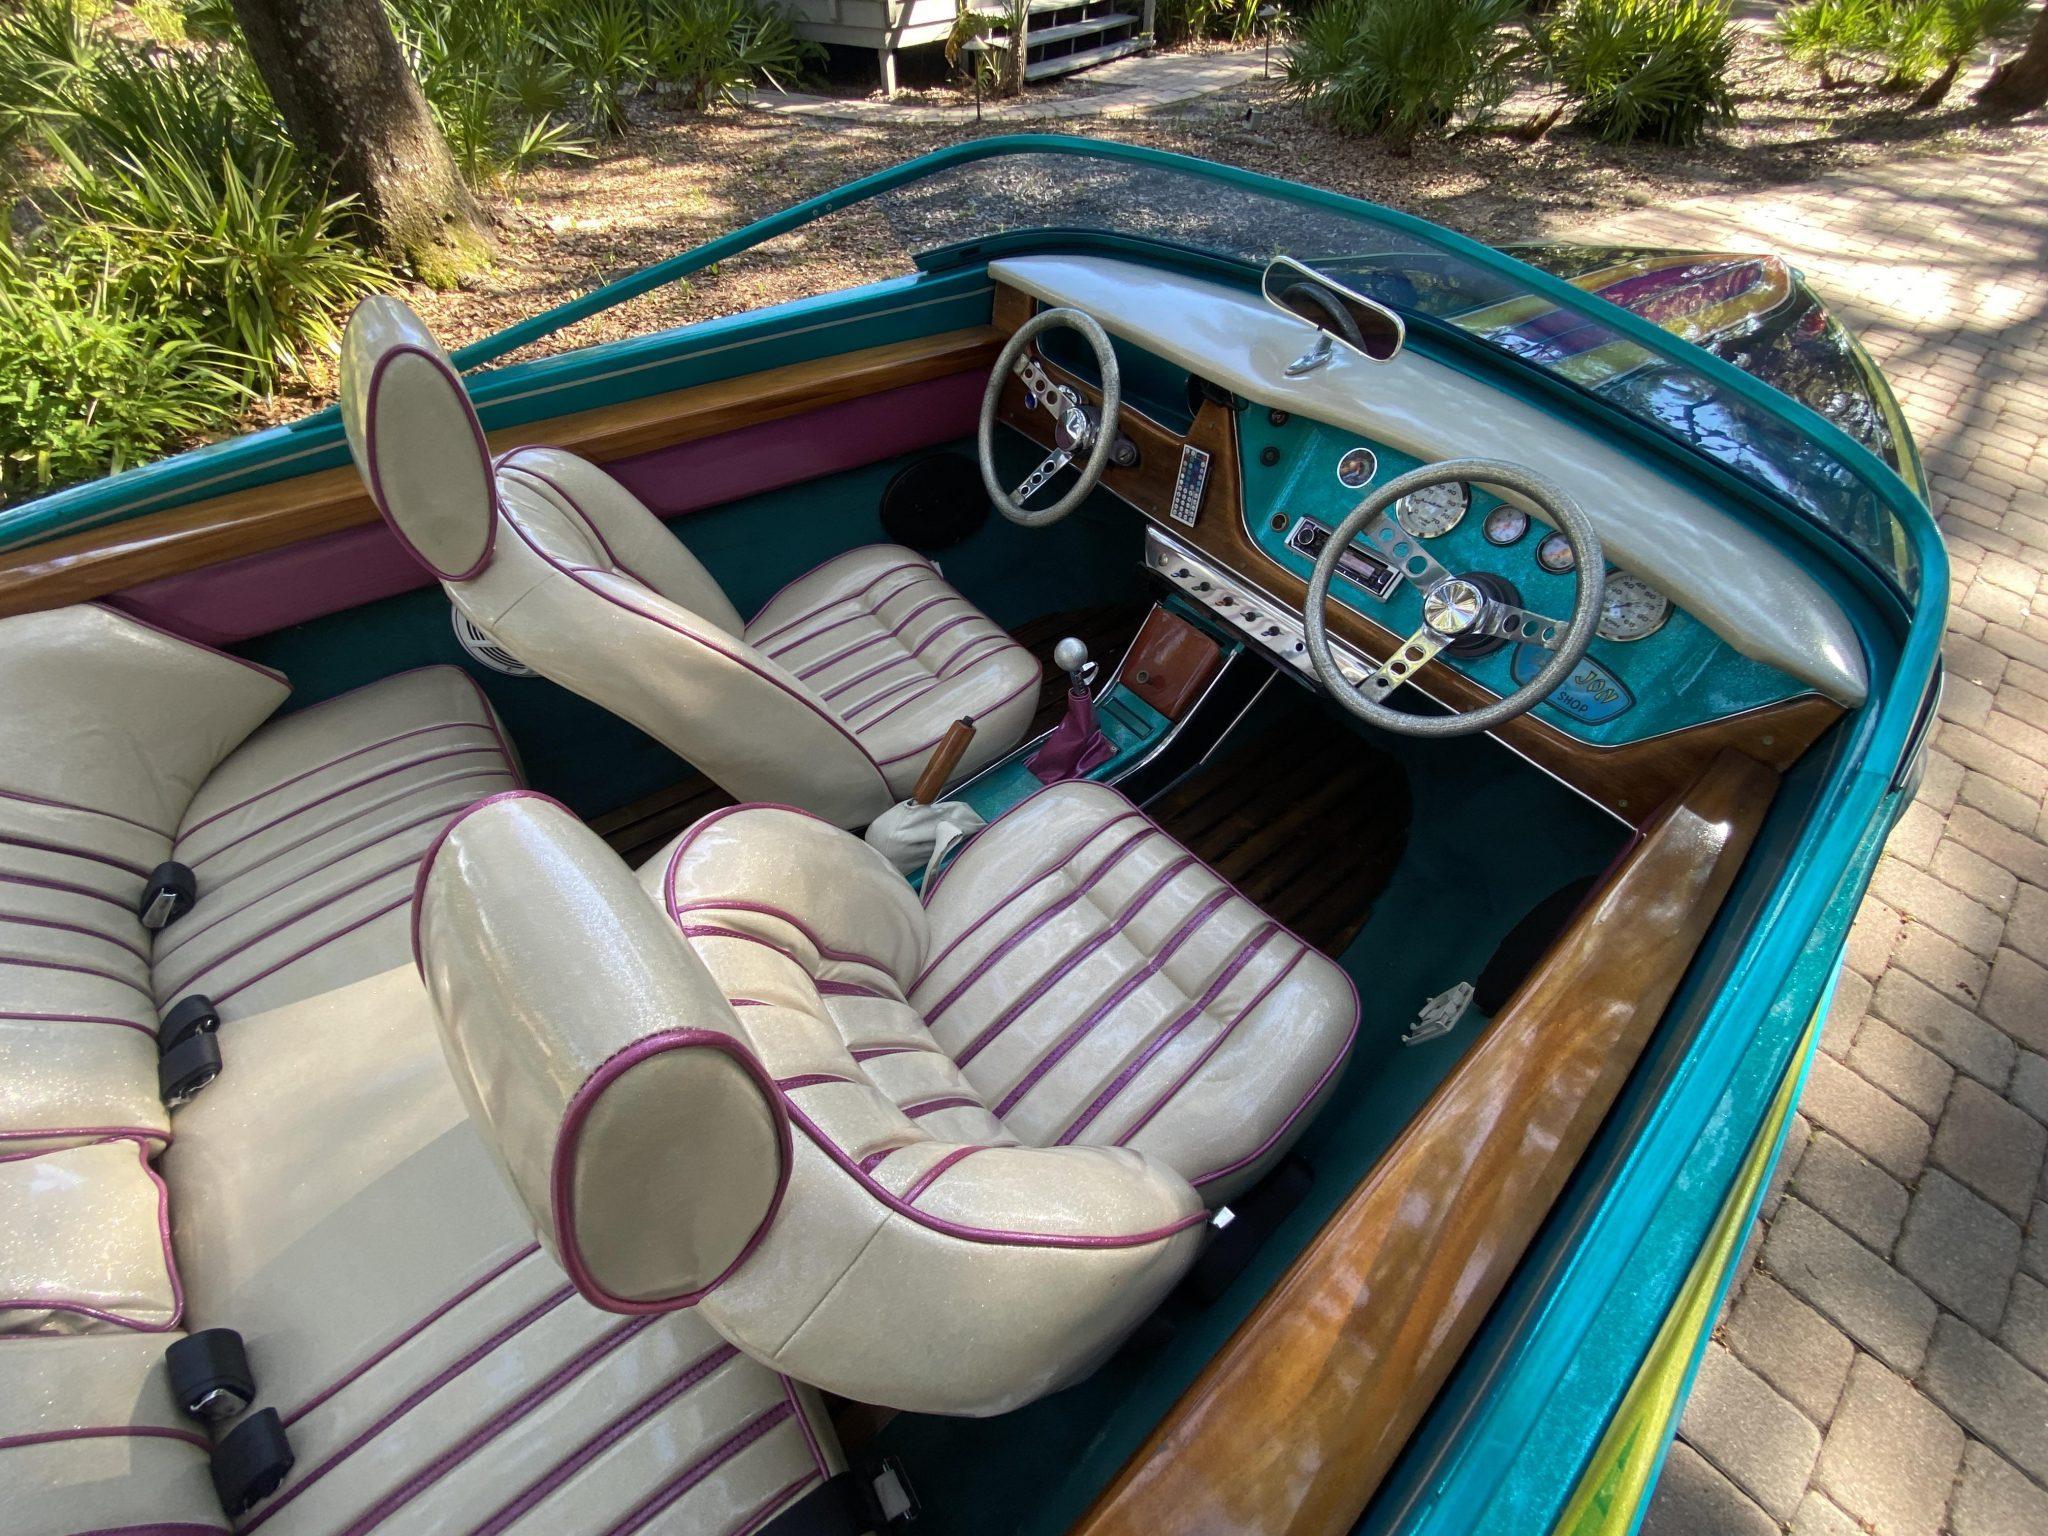 1973_volkswagen_boatswagon_159304099004440bIMG_2203-scaled